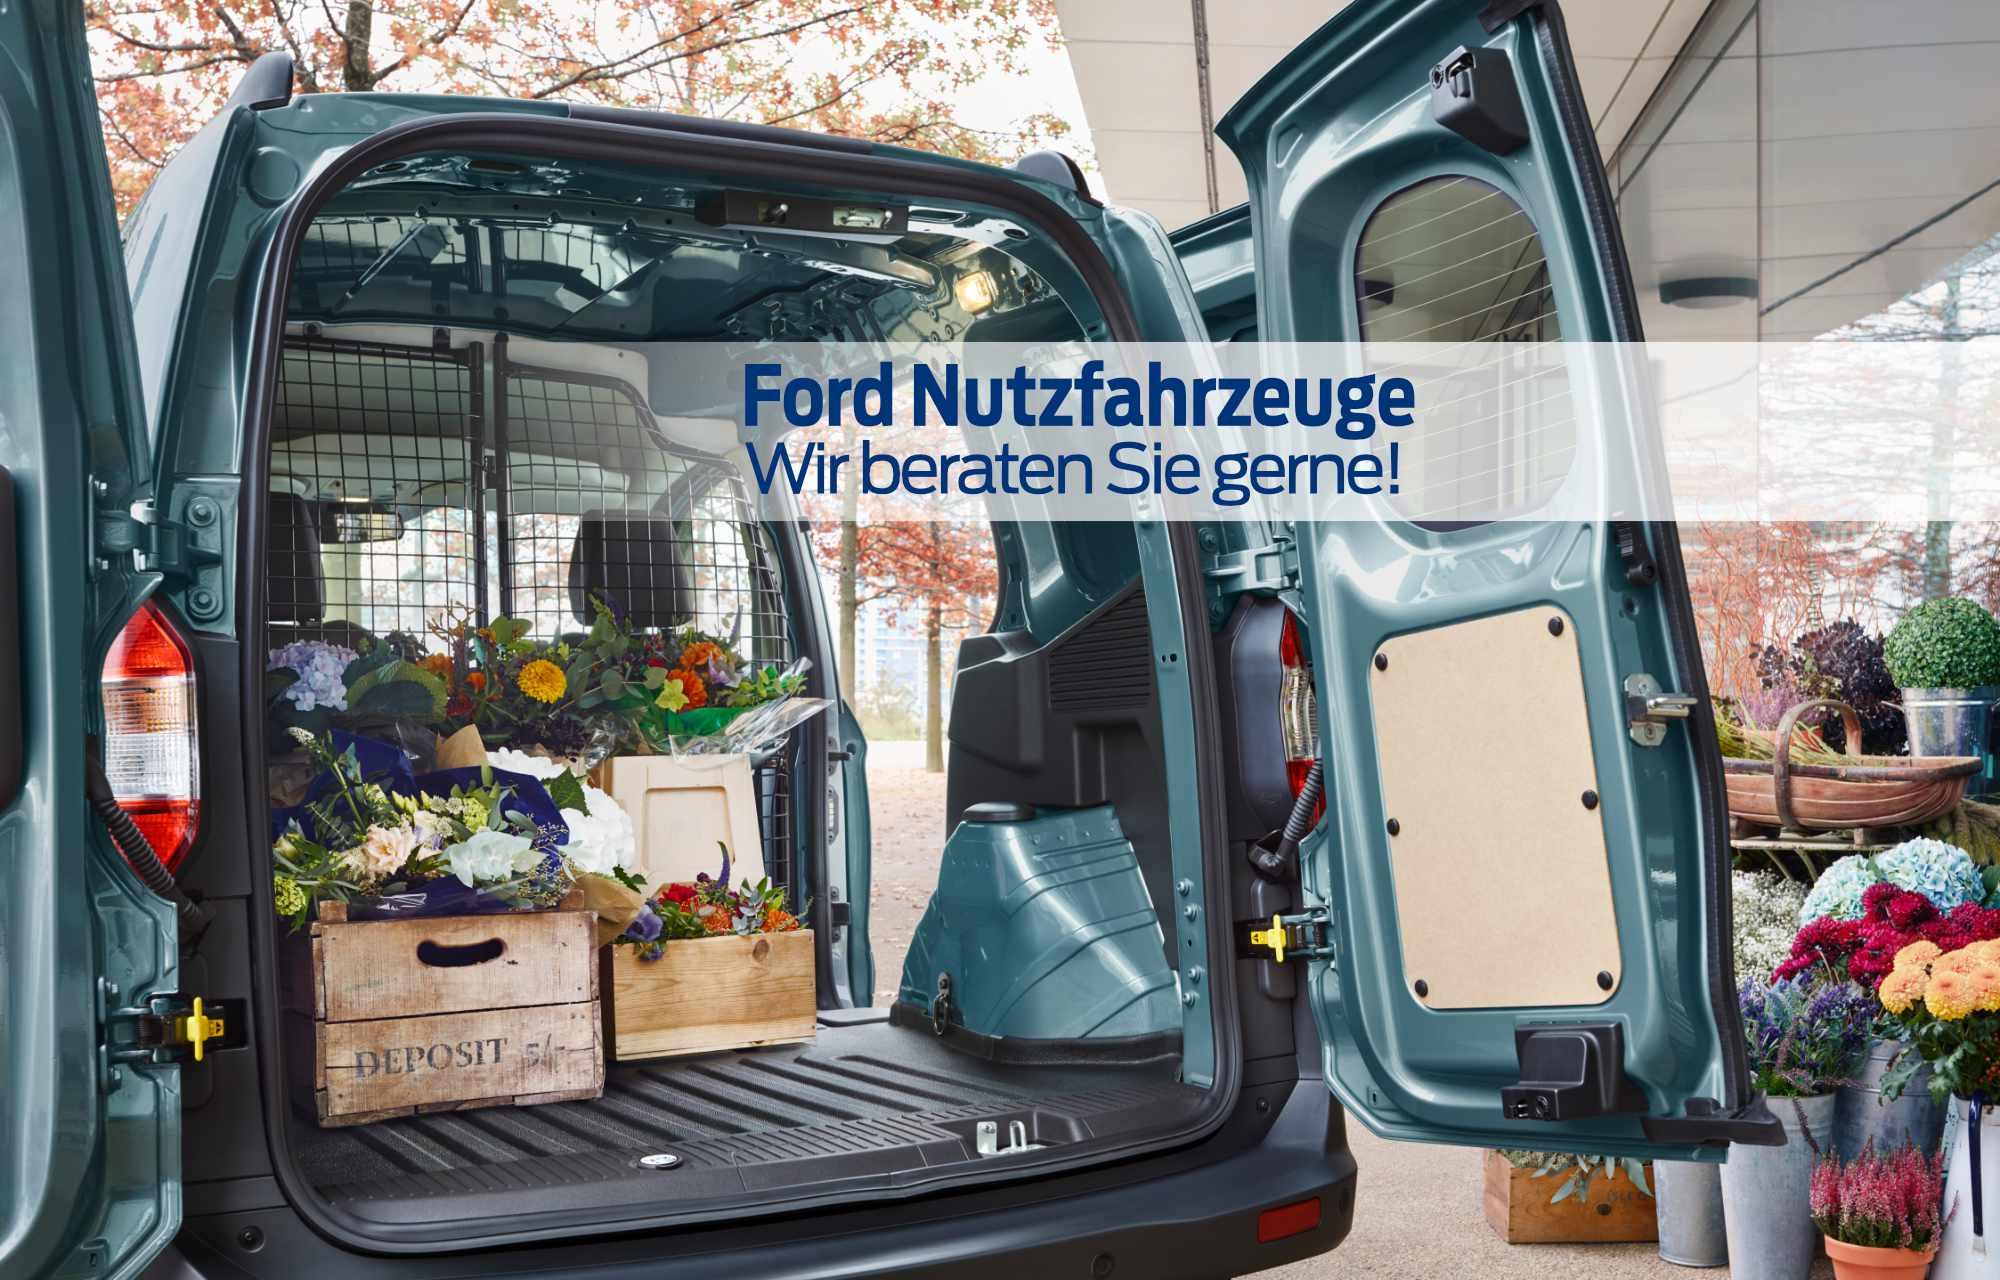 Ford Nutzfahrzeuge Winterthur